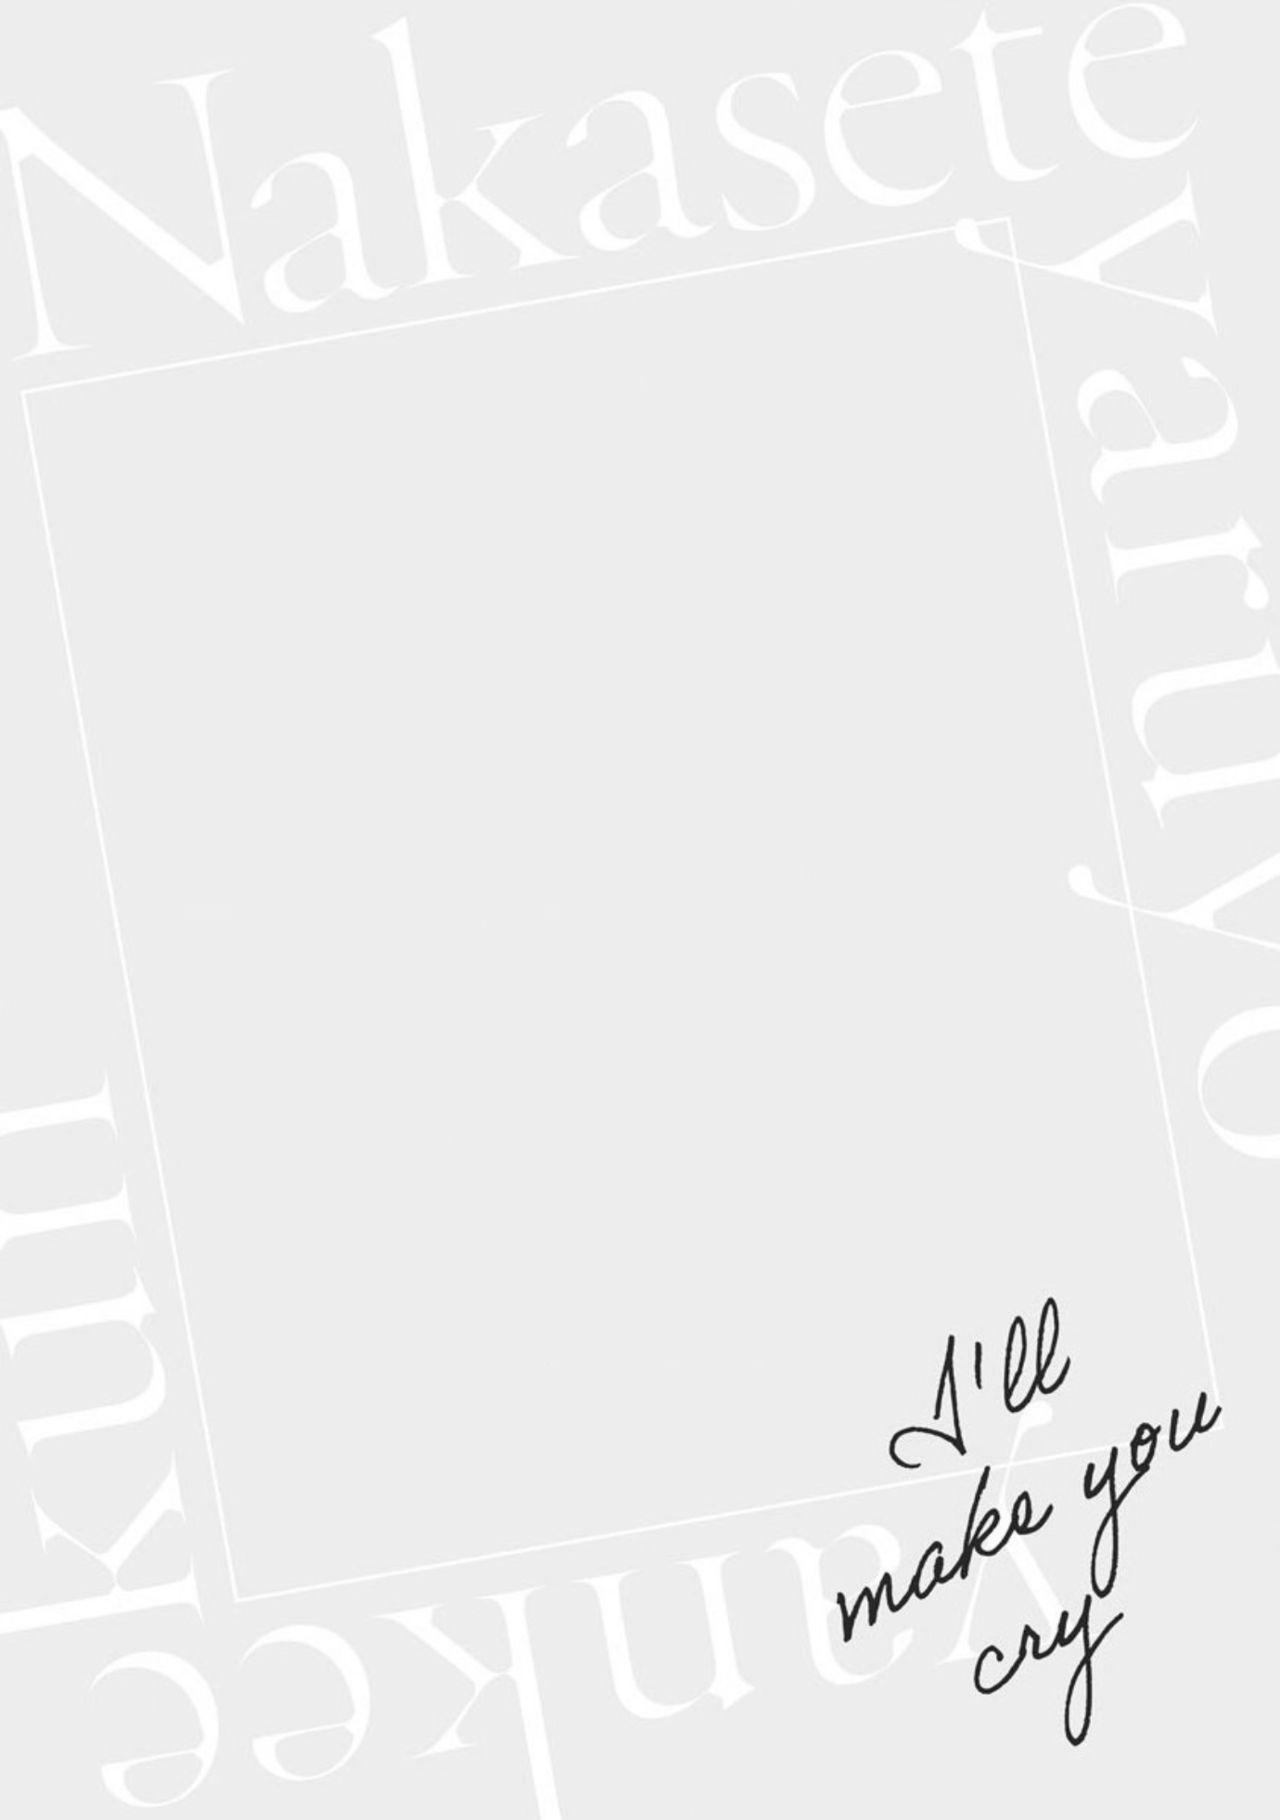 [Hiiragi Nozomu] Nakasete Yaru yo Yankee-kun   I'll Make You Cry Ch. 1-5 + Extras [English] [Digital] 190